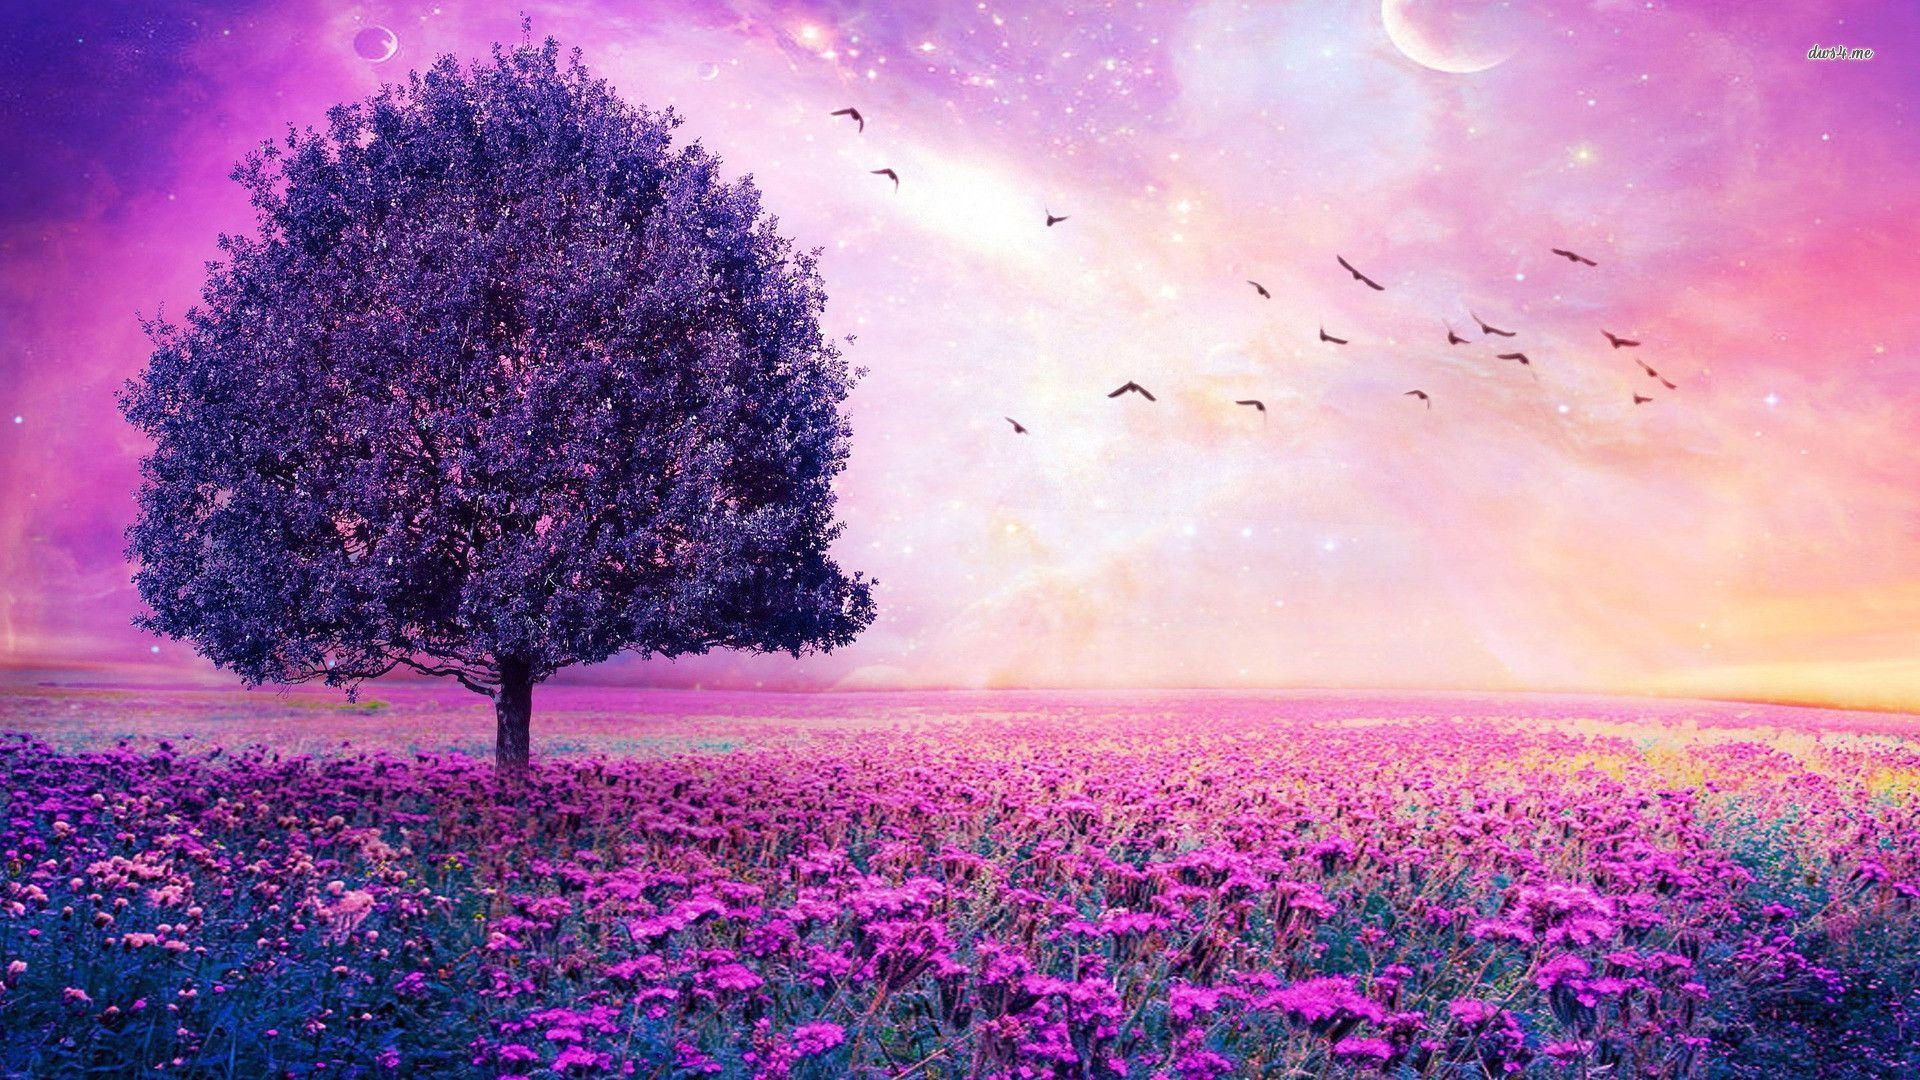 Violet Smoke Art Wallpapers: Purple Haze Wallpapers